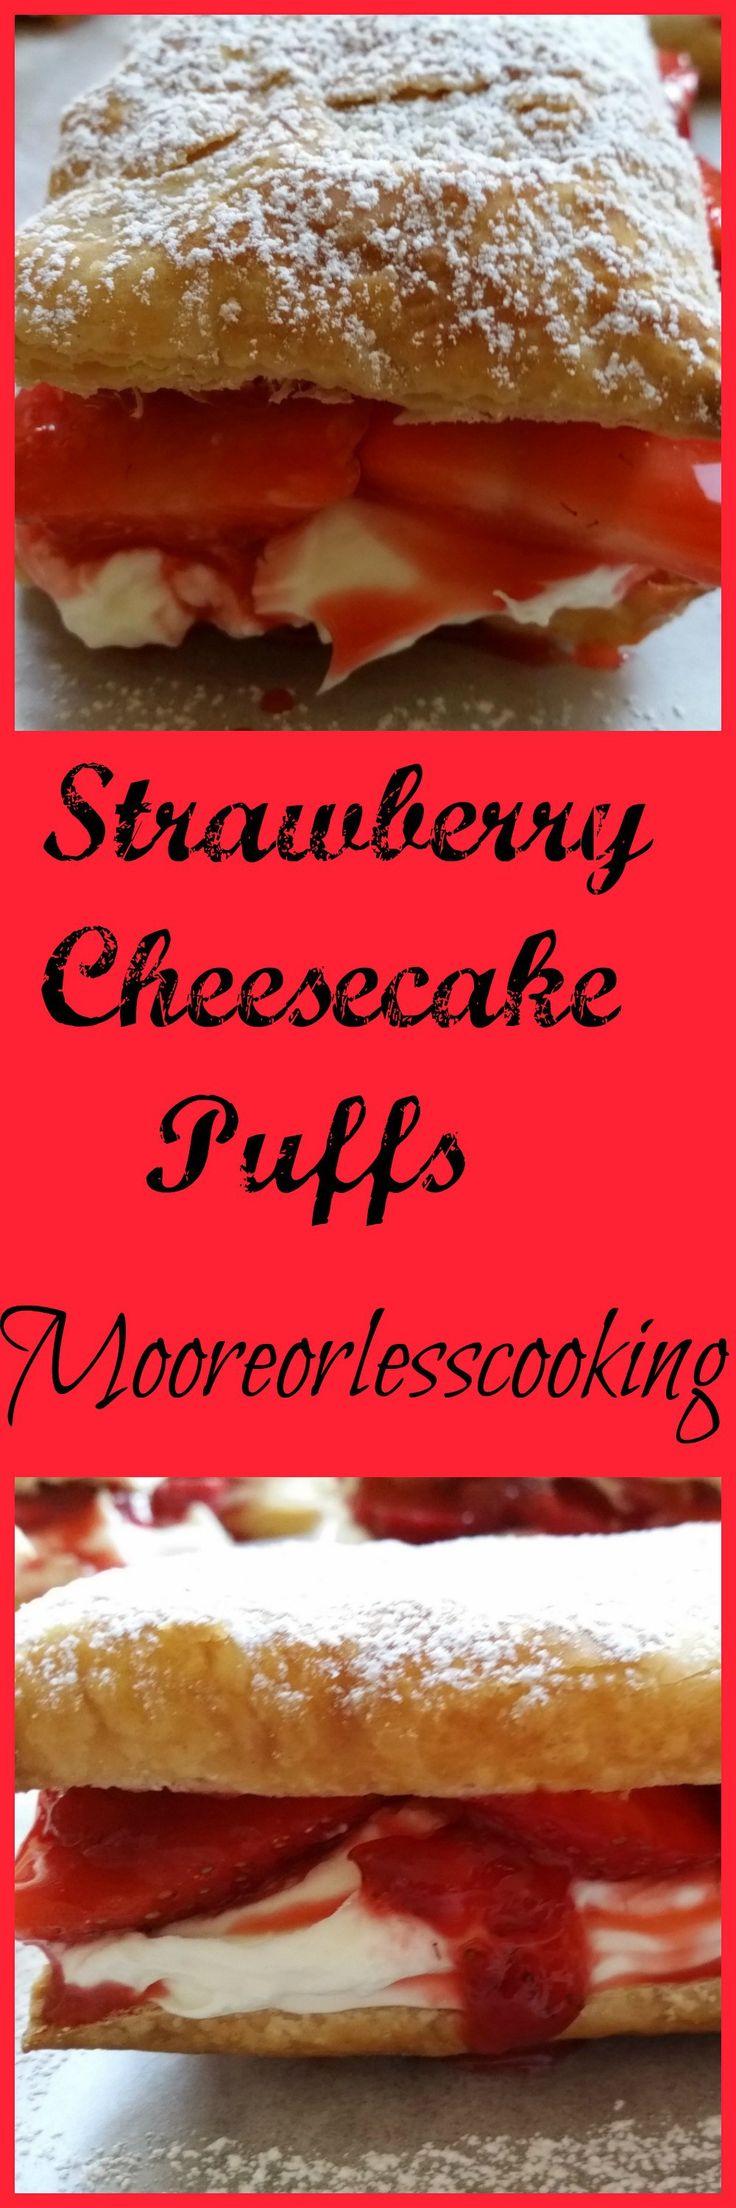 Strawberry Cheesecake Puffs #SundaySupper